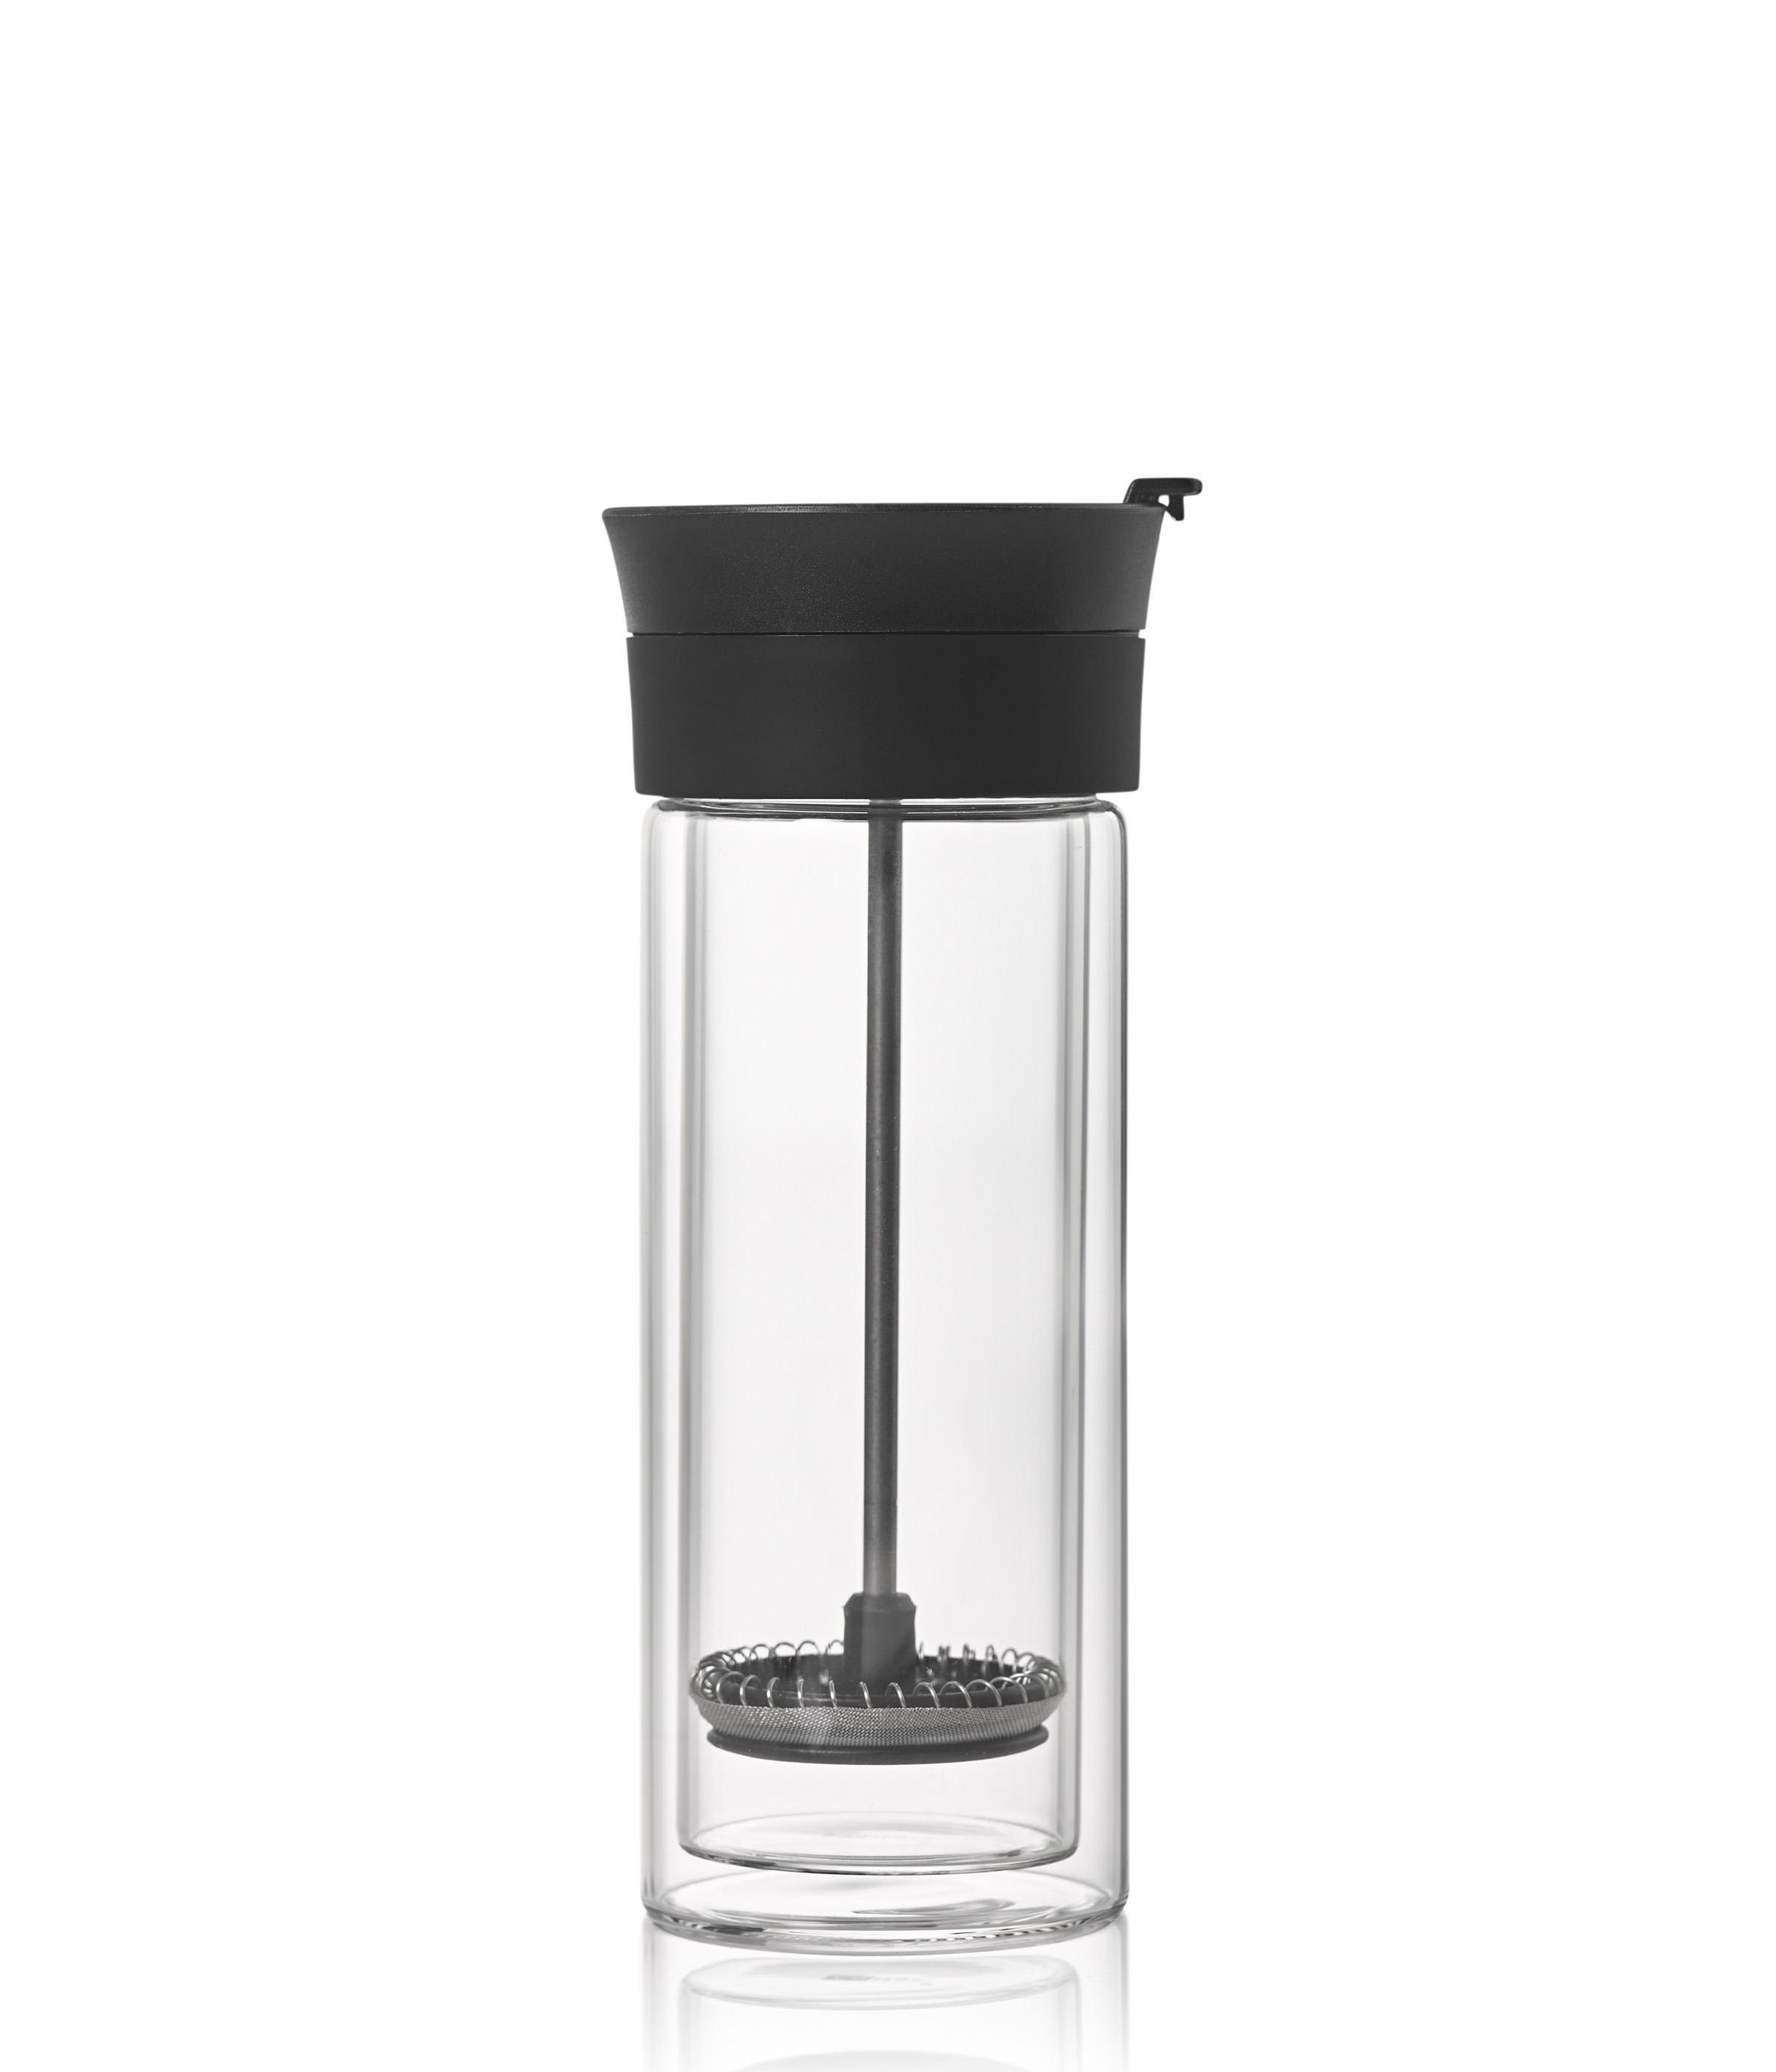 Doppelwandiger French-Press Kaffeebecher THERMO-GLASS